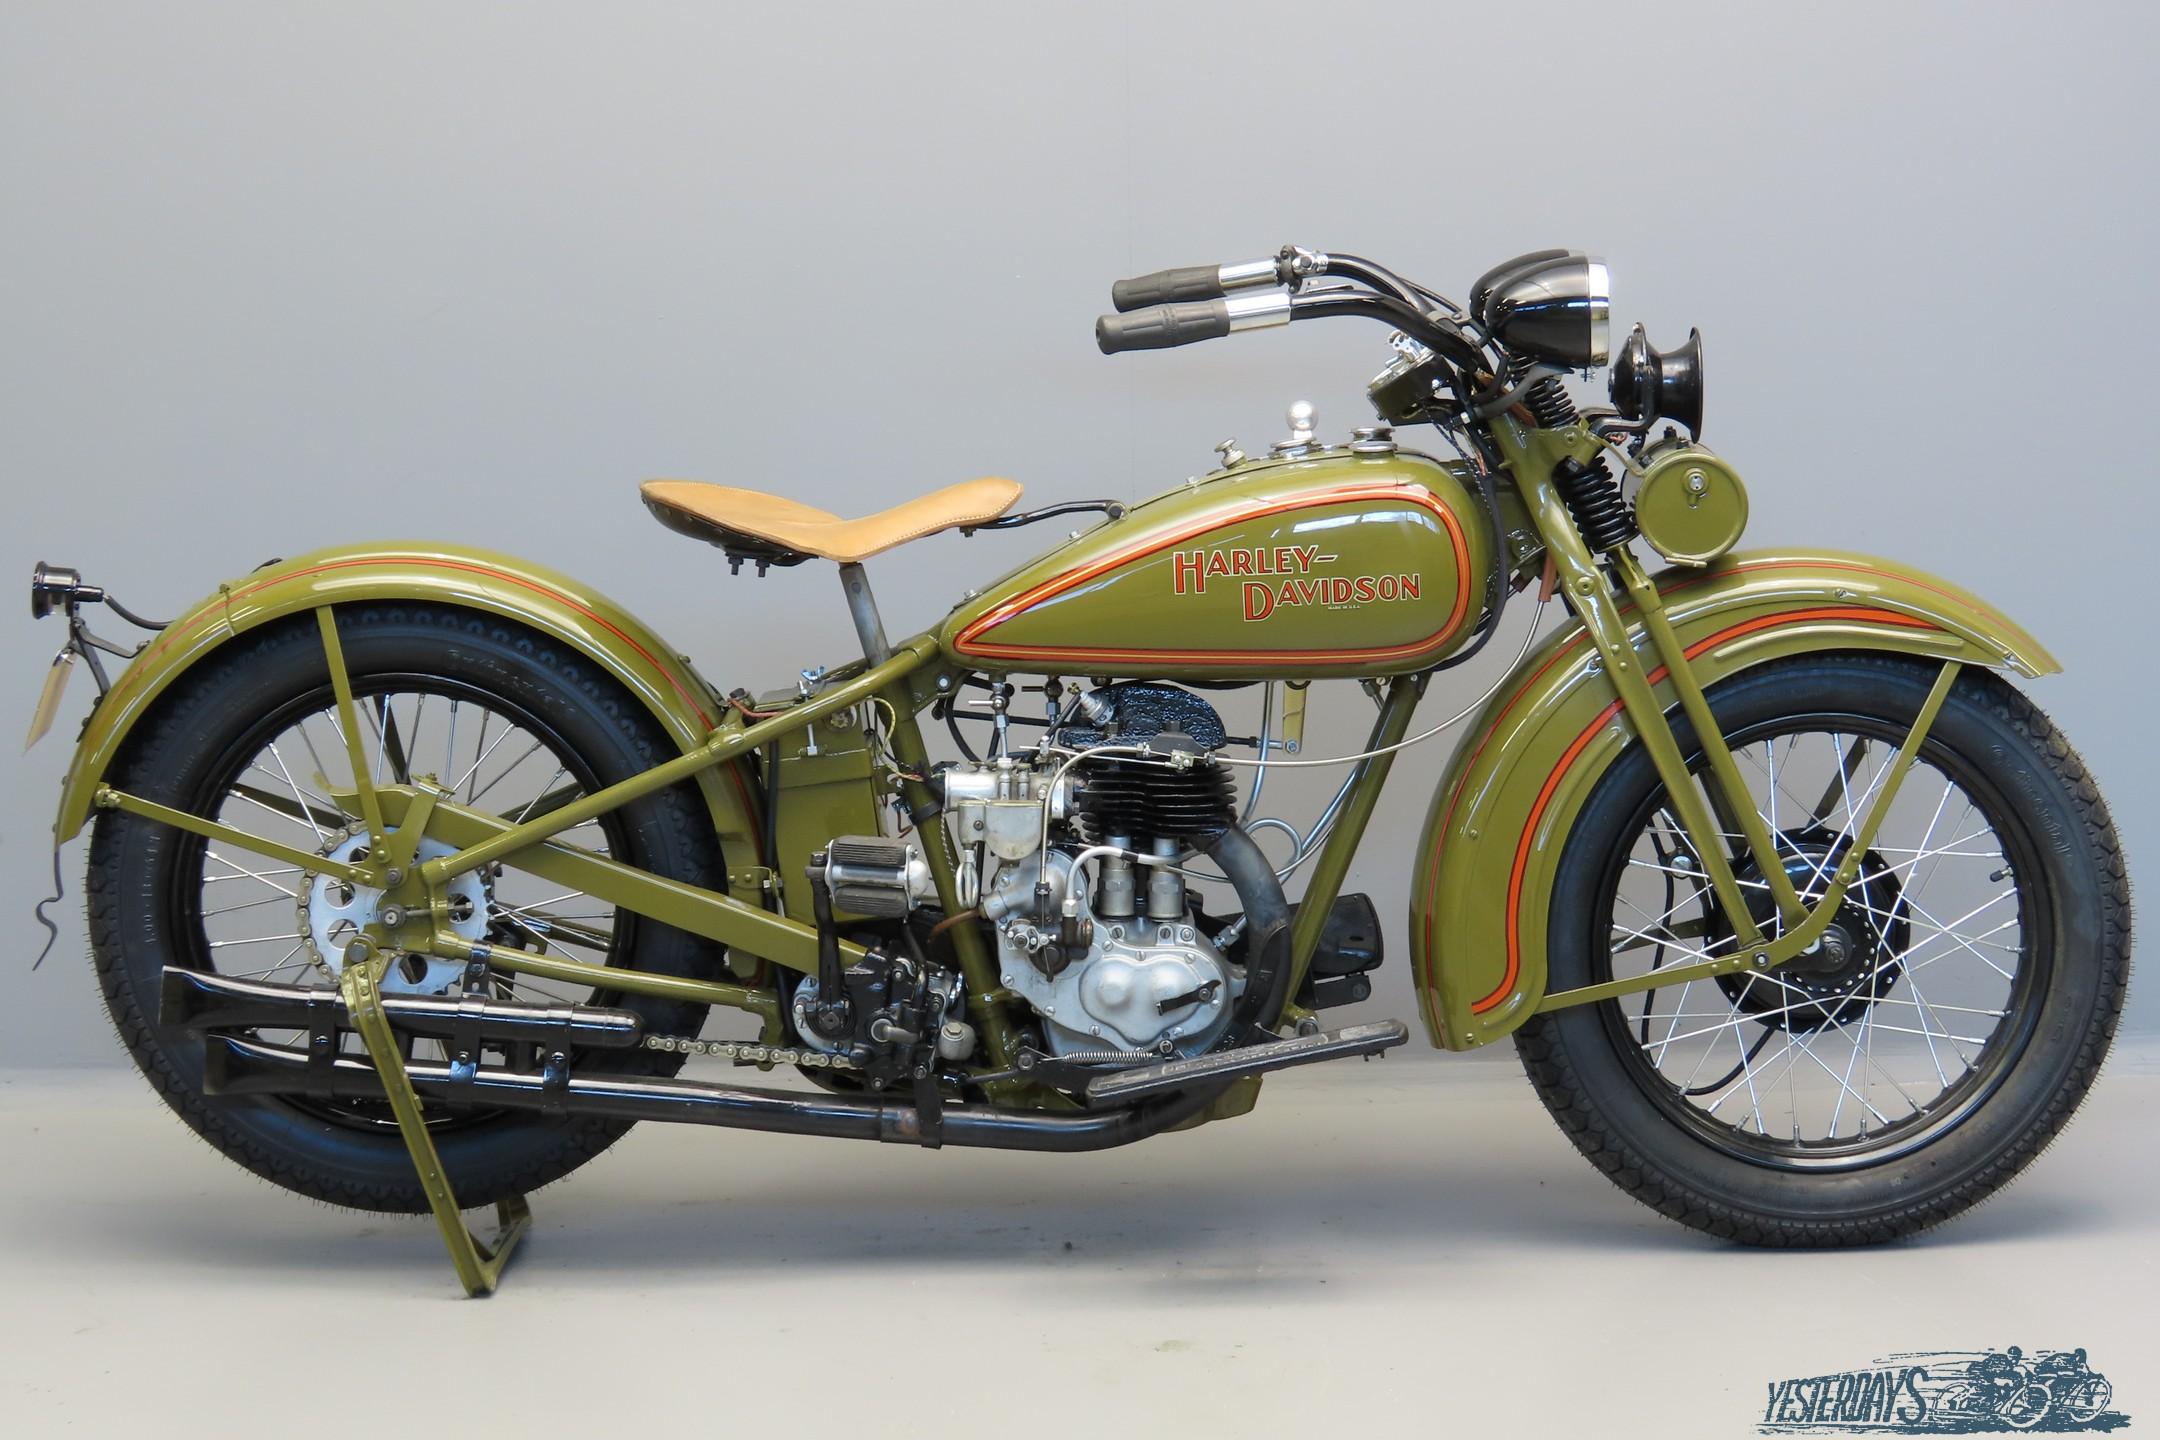 Harley Davidson 1930 30C  493cc 1 cyl sv  3007